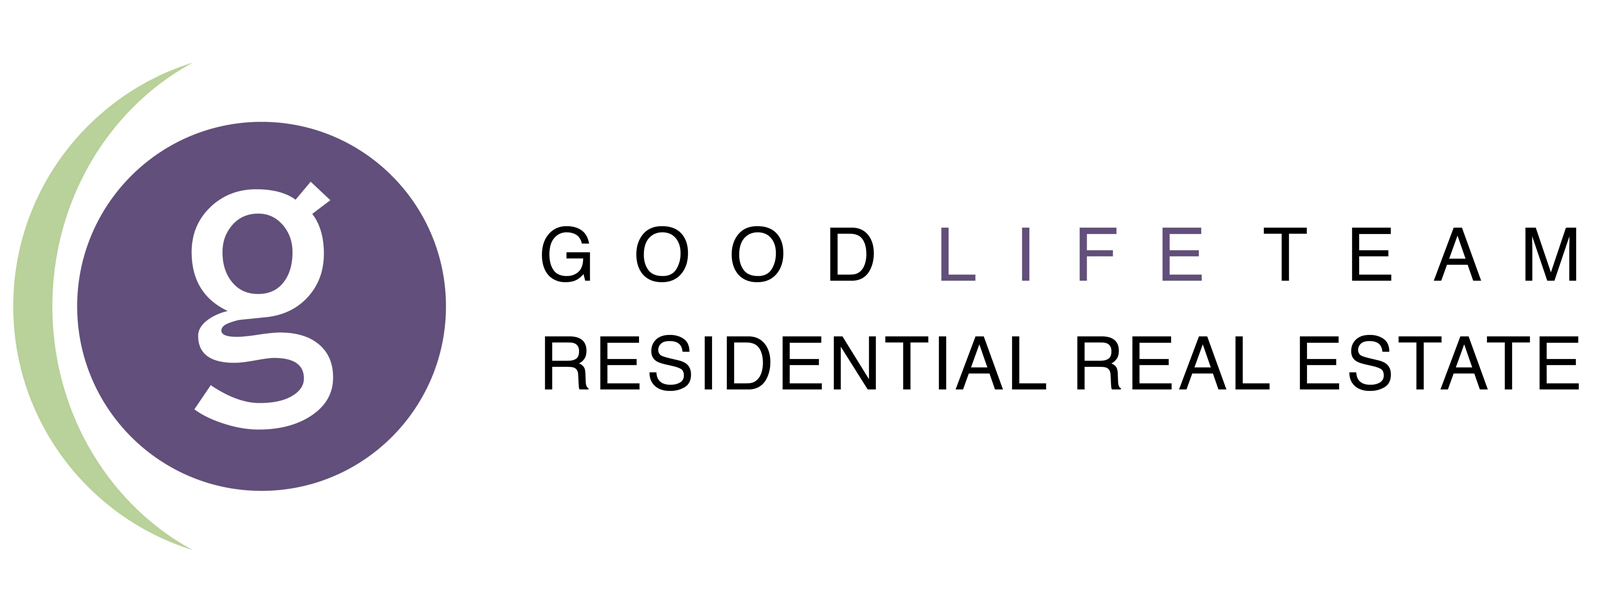 GoodLife Team Residential Real Estate logo